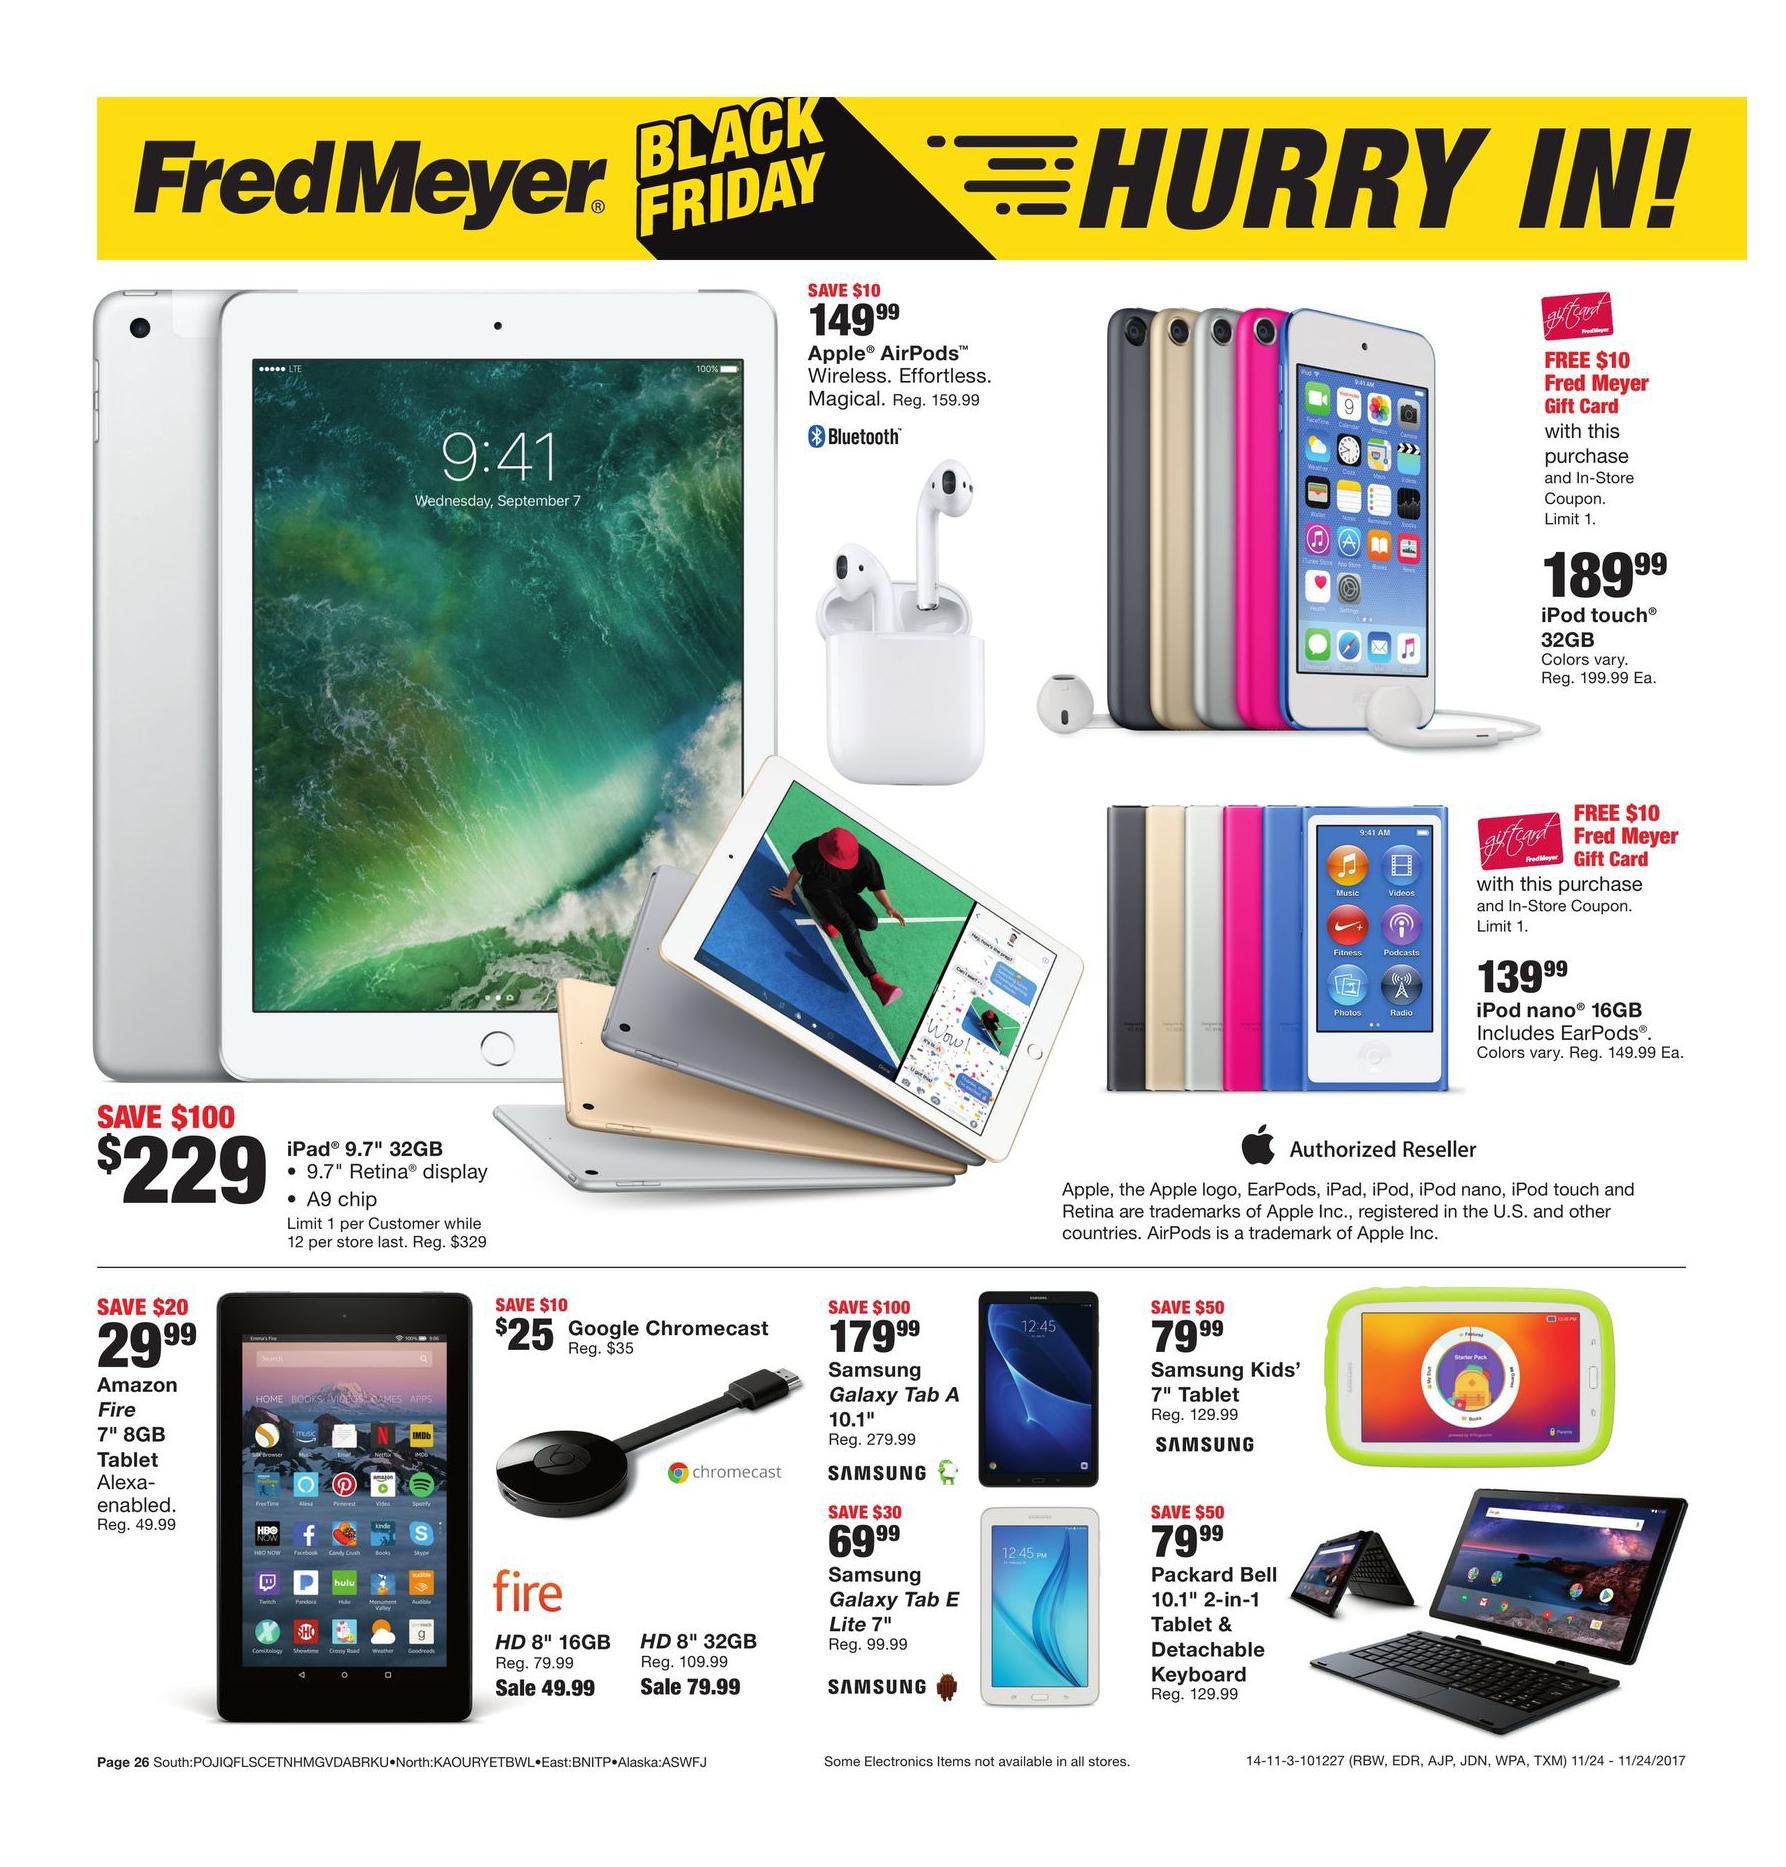 Fred Meyer Black Friday 2018 Ads and Deals (Dengan gambar)